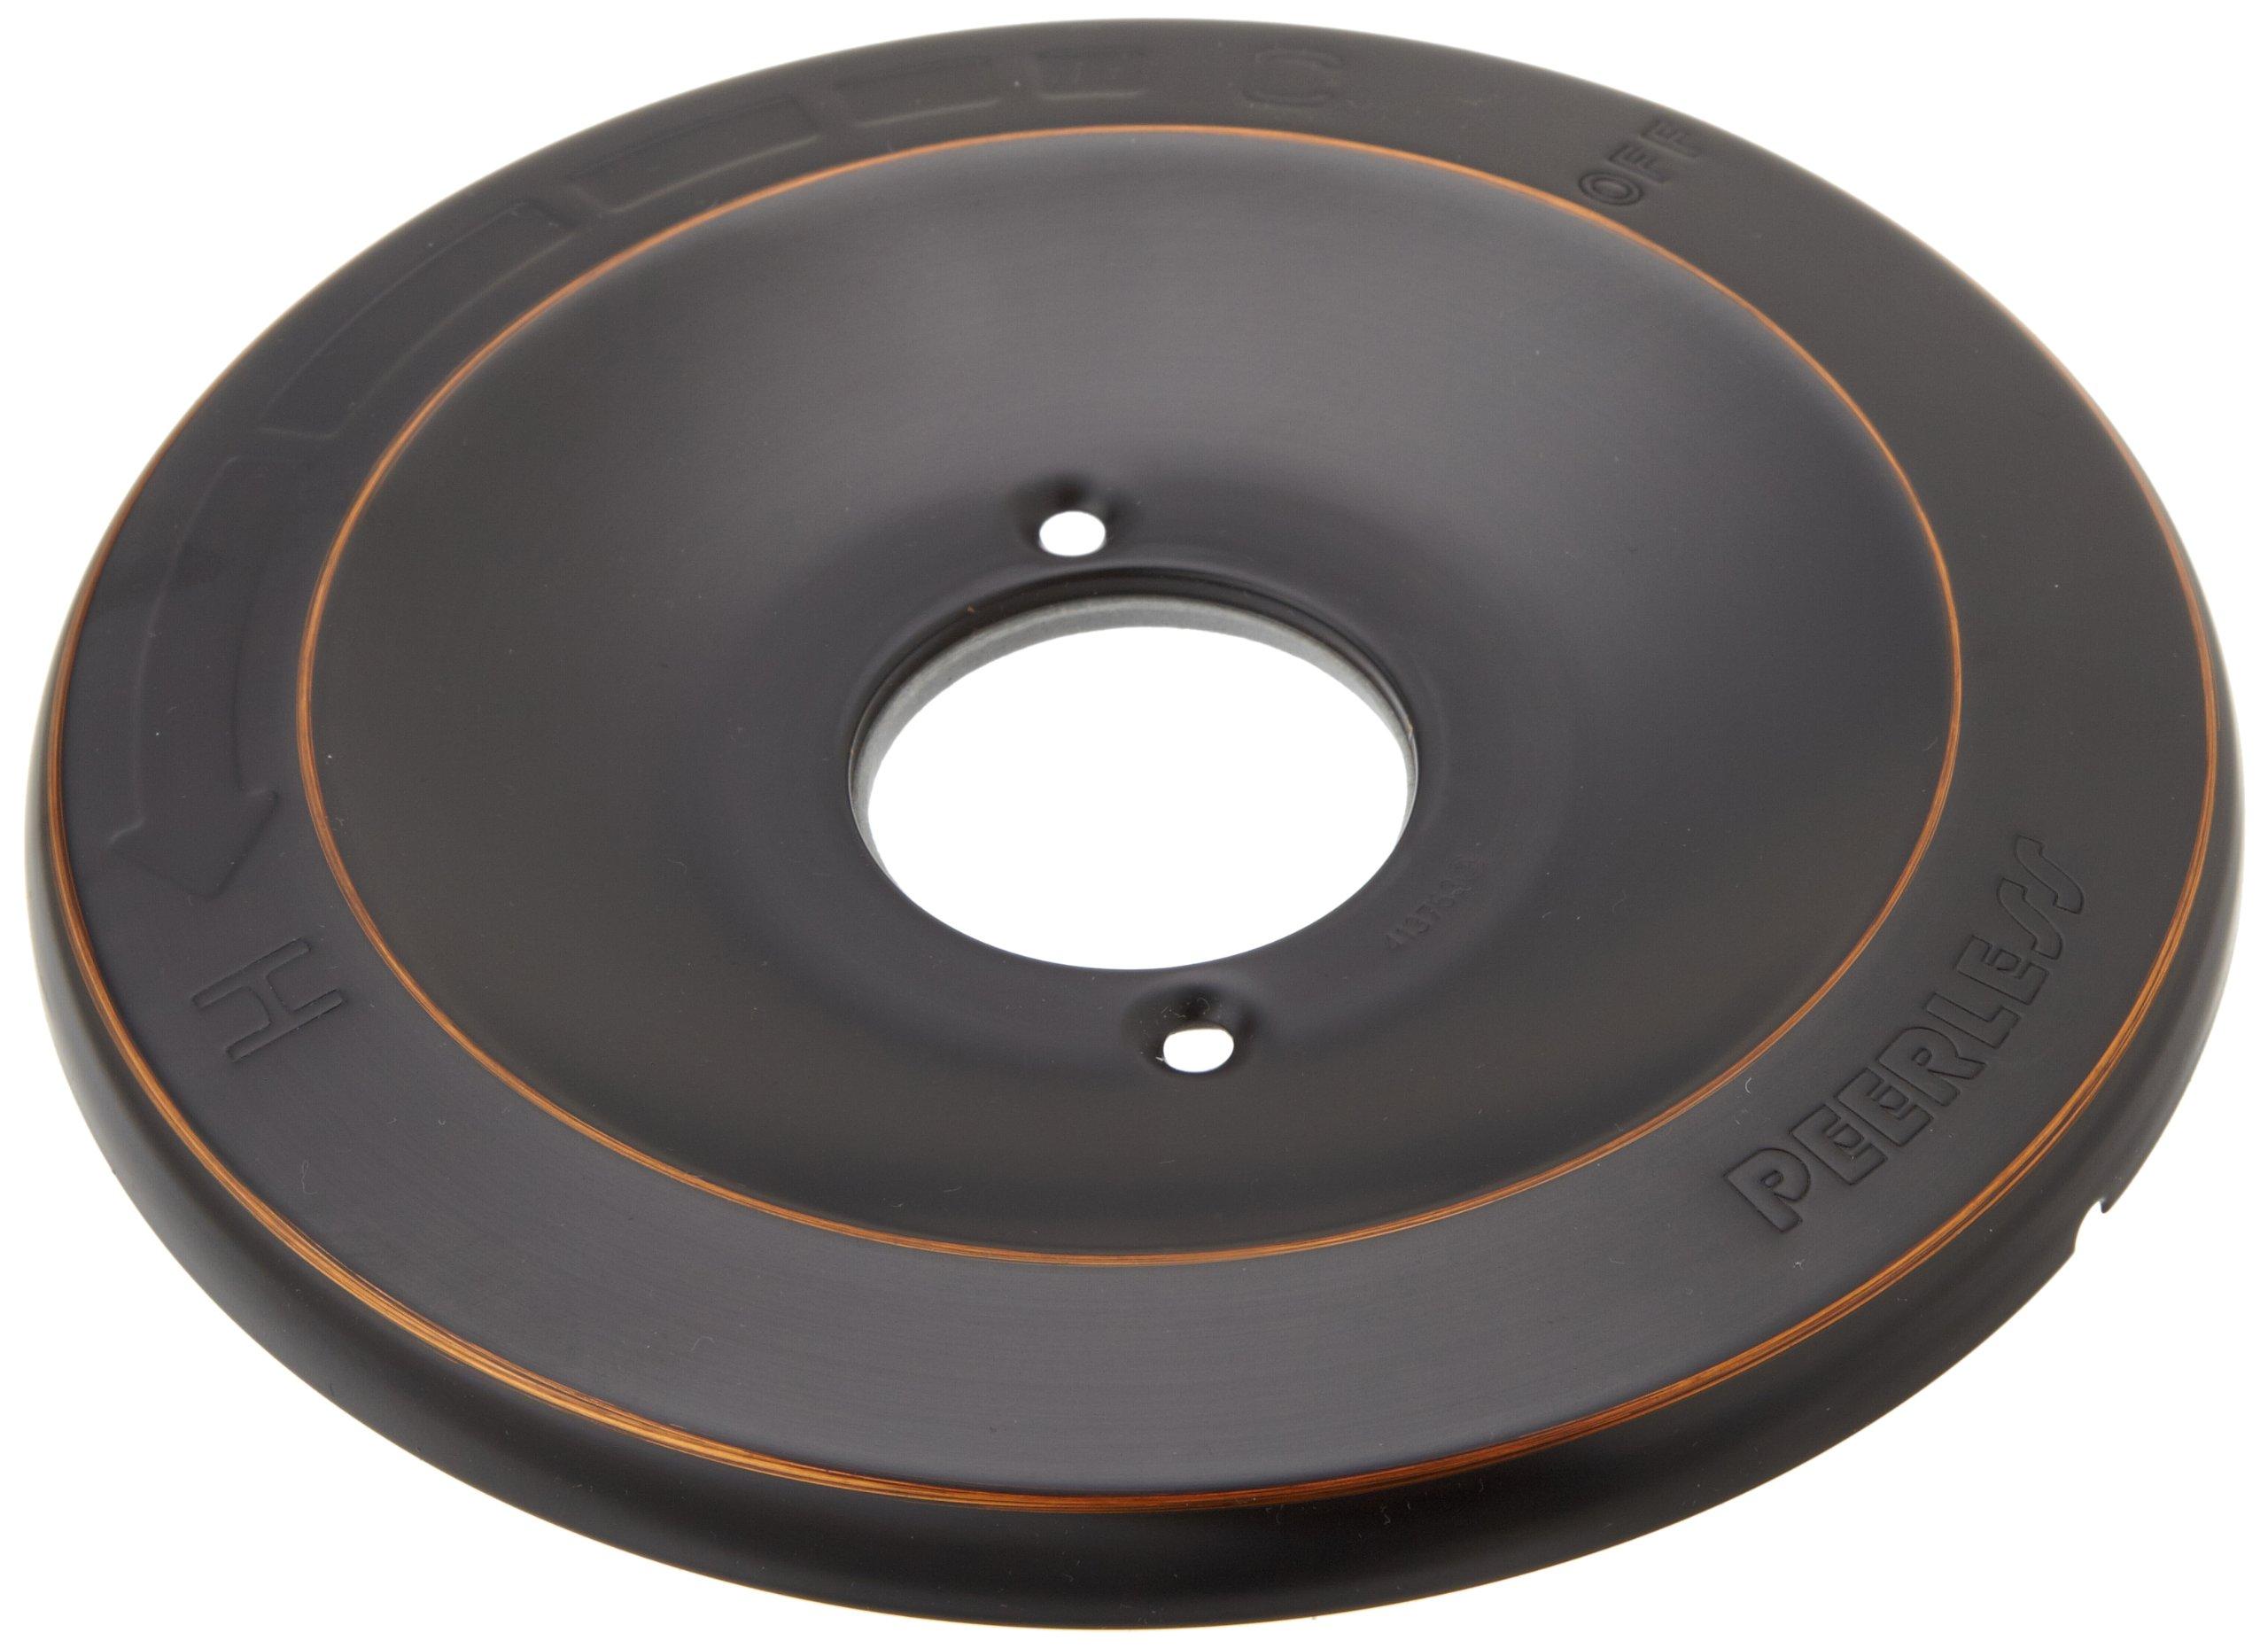 Peerless RP70535OB Escutcheon, Oil Bronze